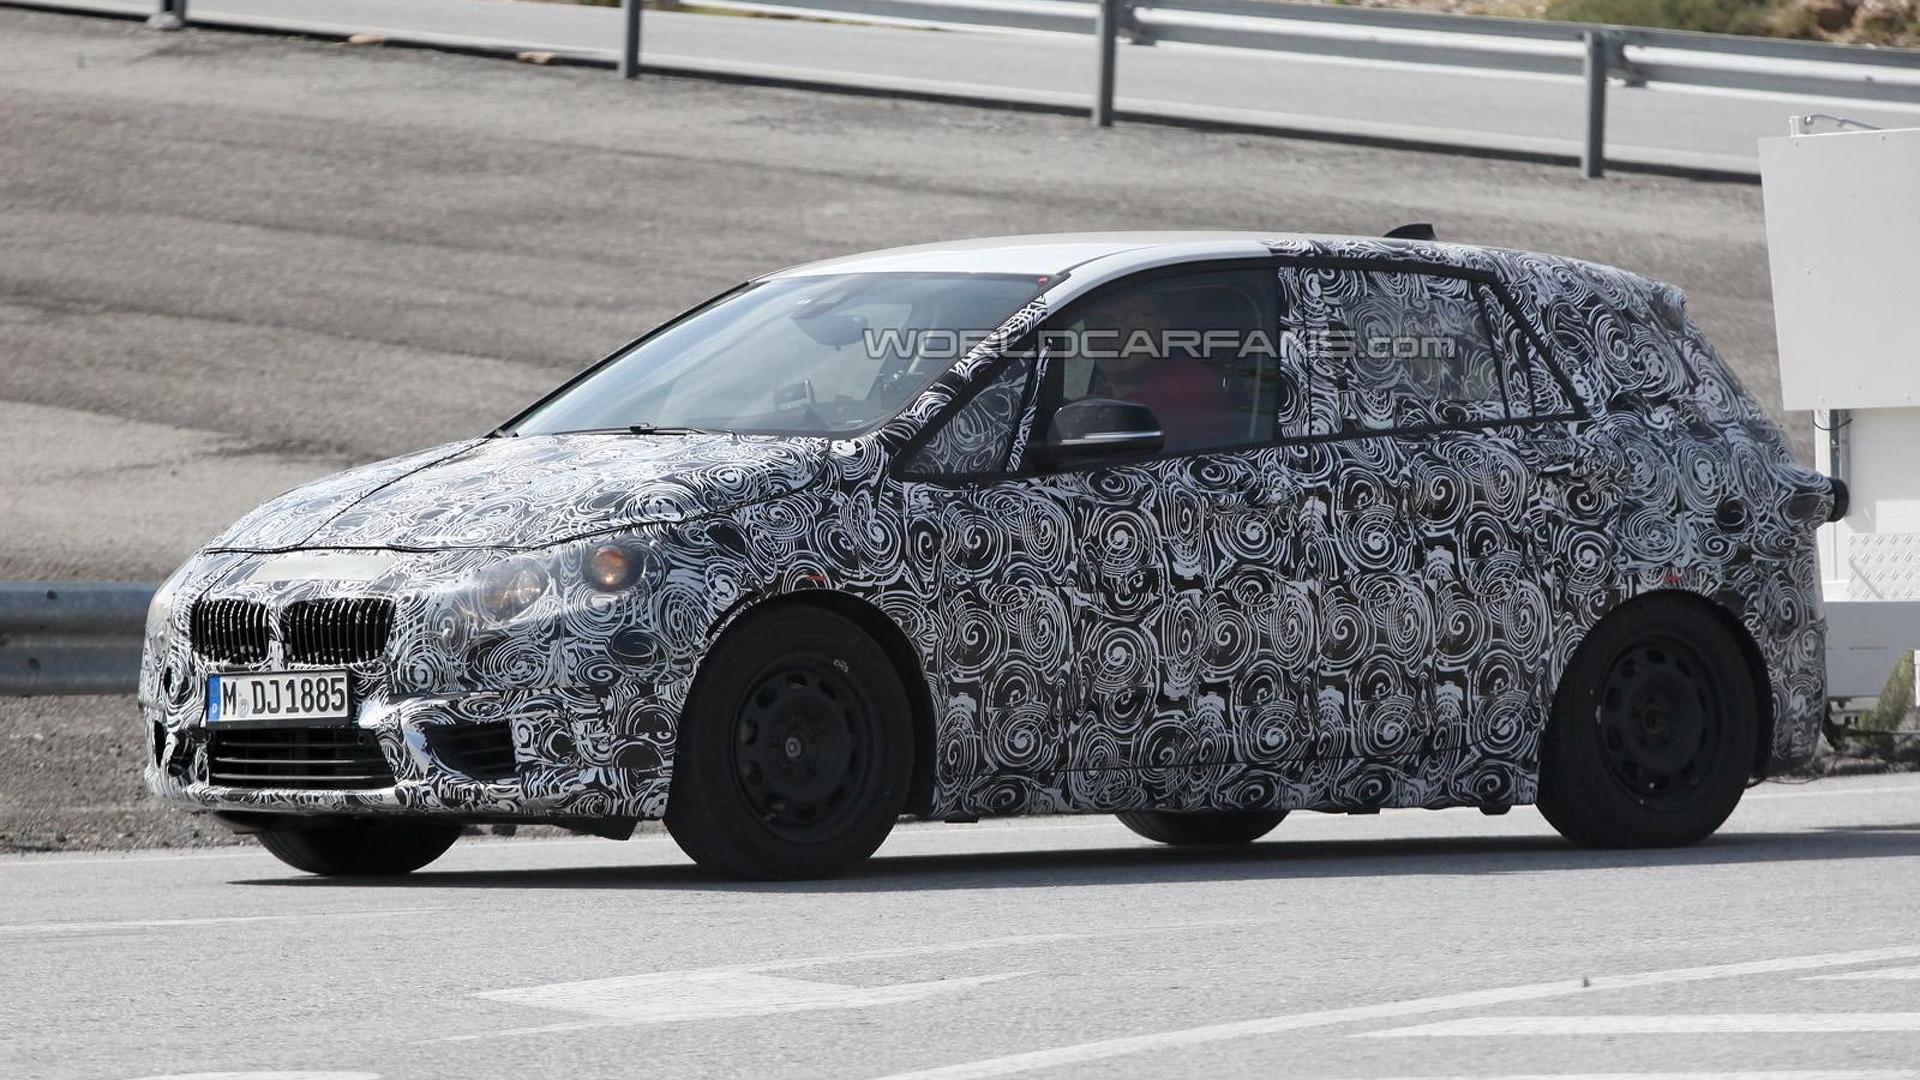 BMW planning next-gen front-wheel drive 1-Series frugal versions - report